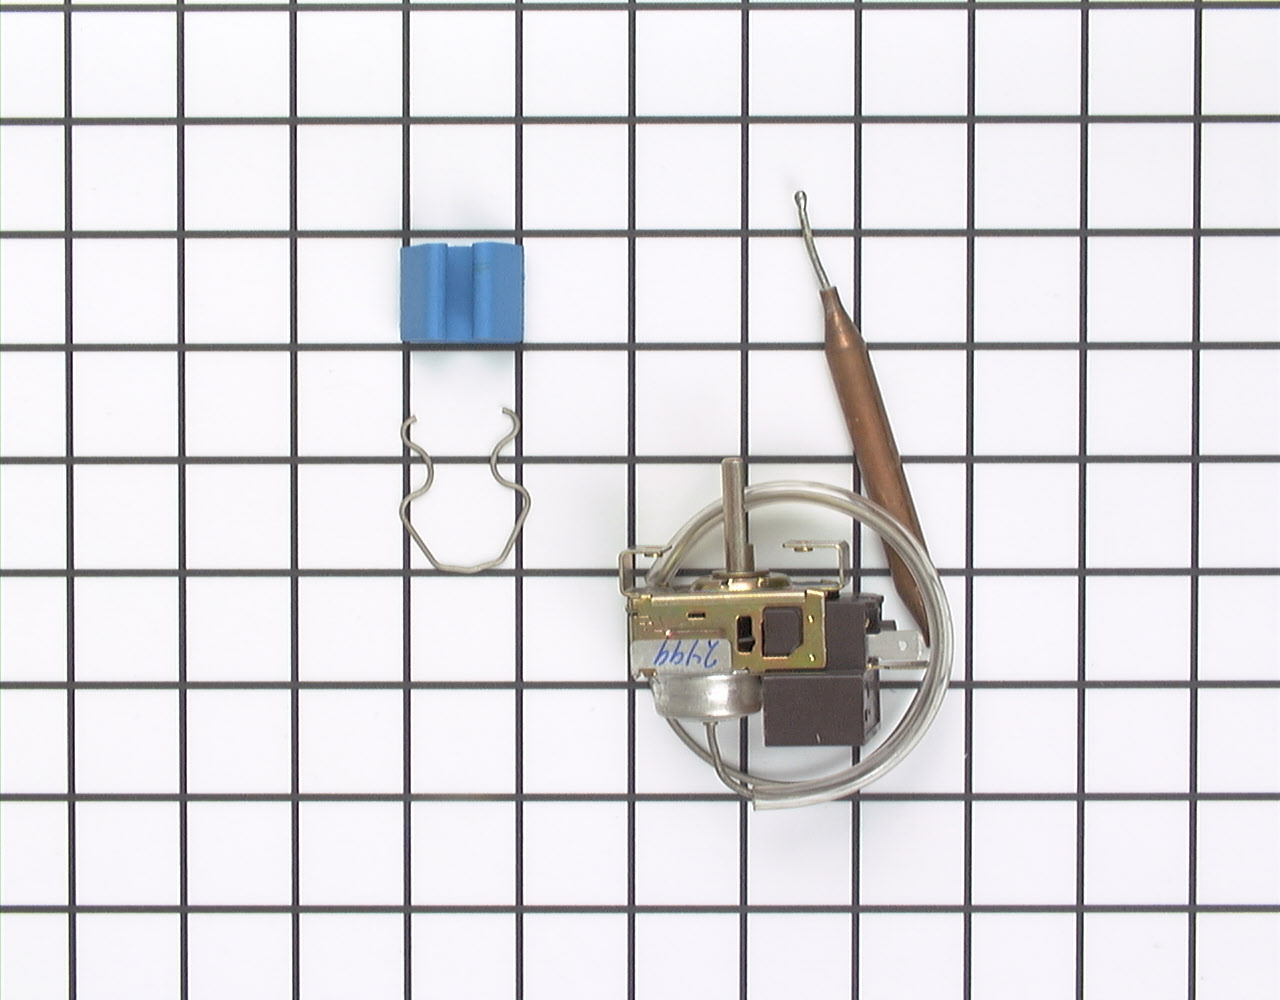 Kenmore Air Conditioner Part # WP1160325 - Temperature Control Thermostat